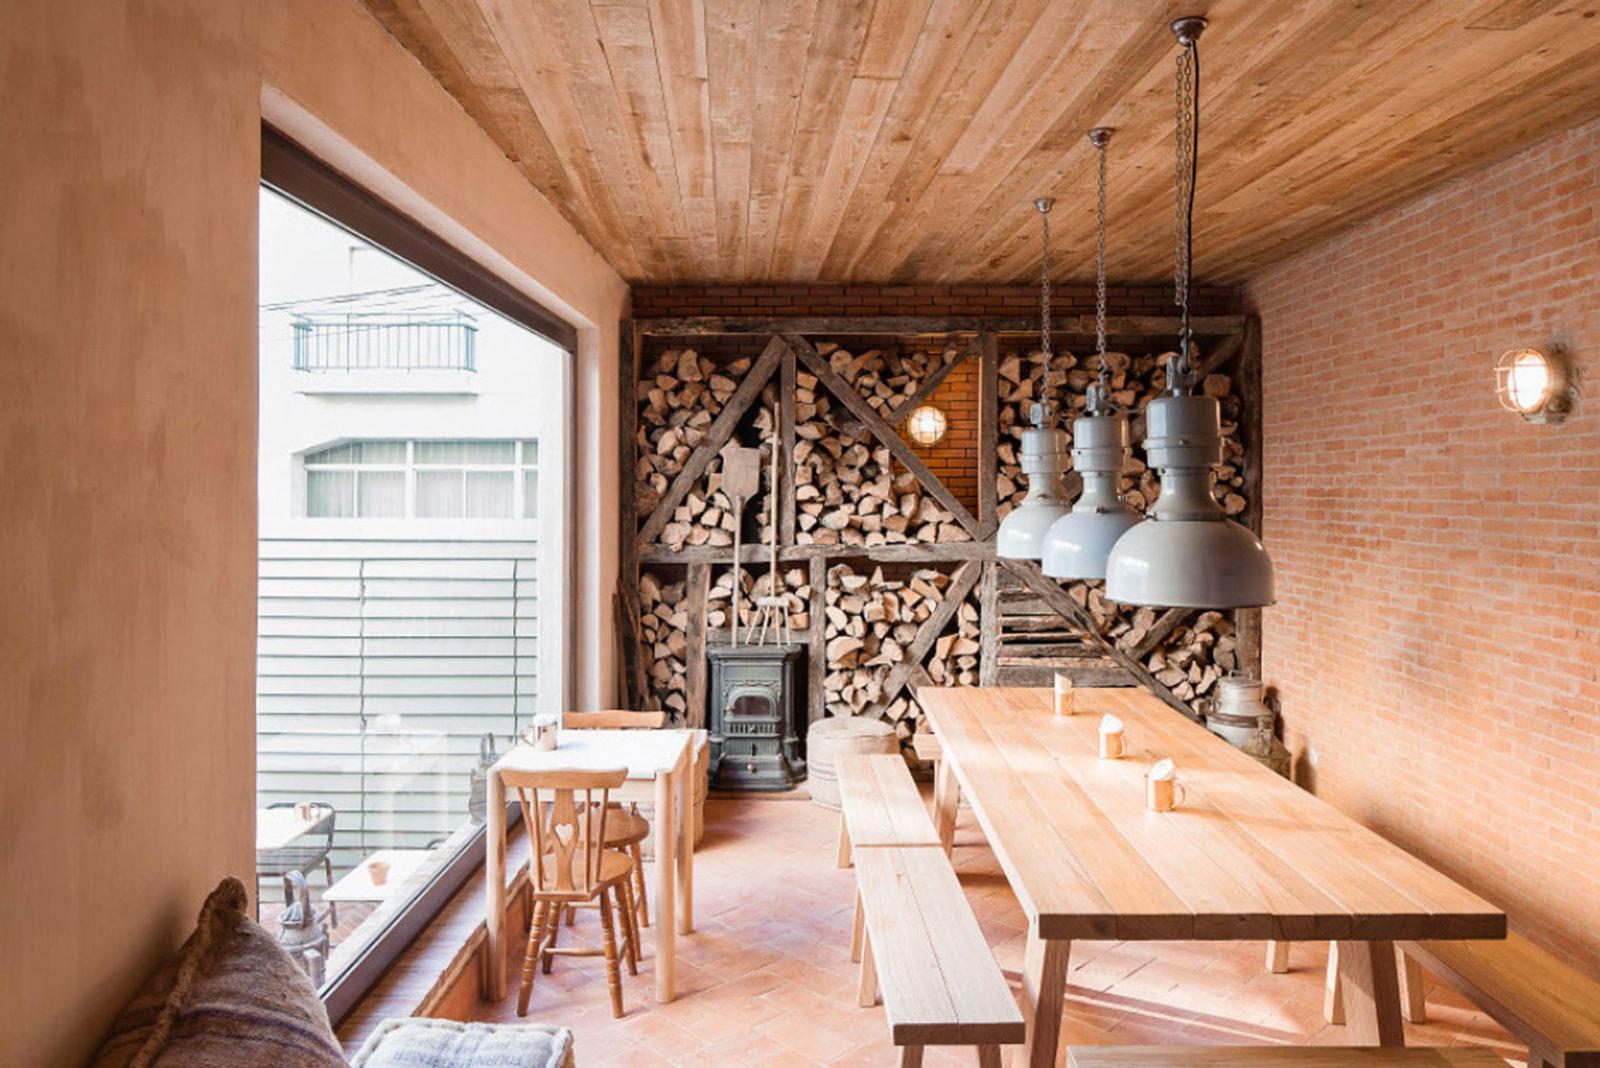 A Padaria Portuguese Bakery Interior Design.